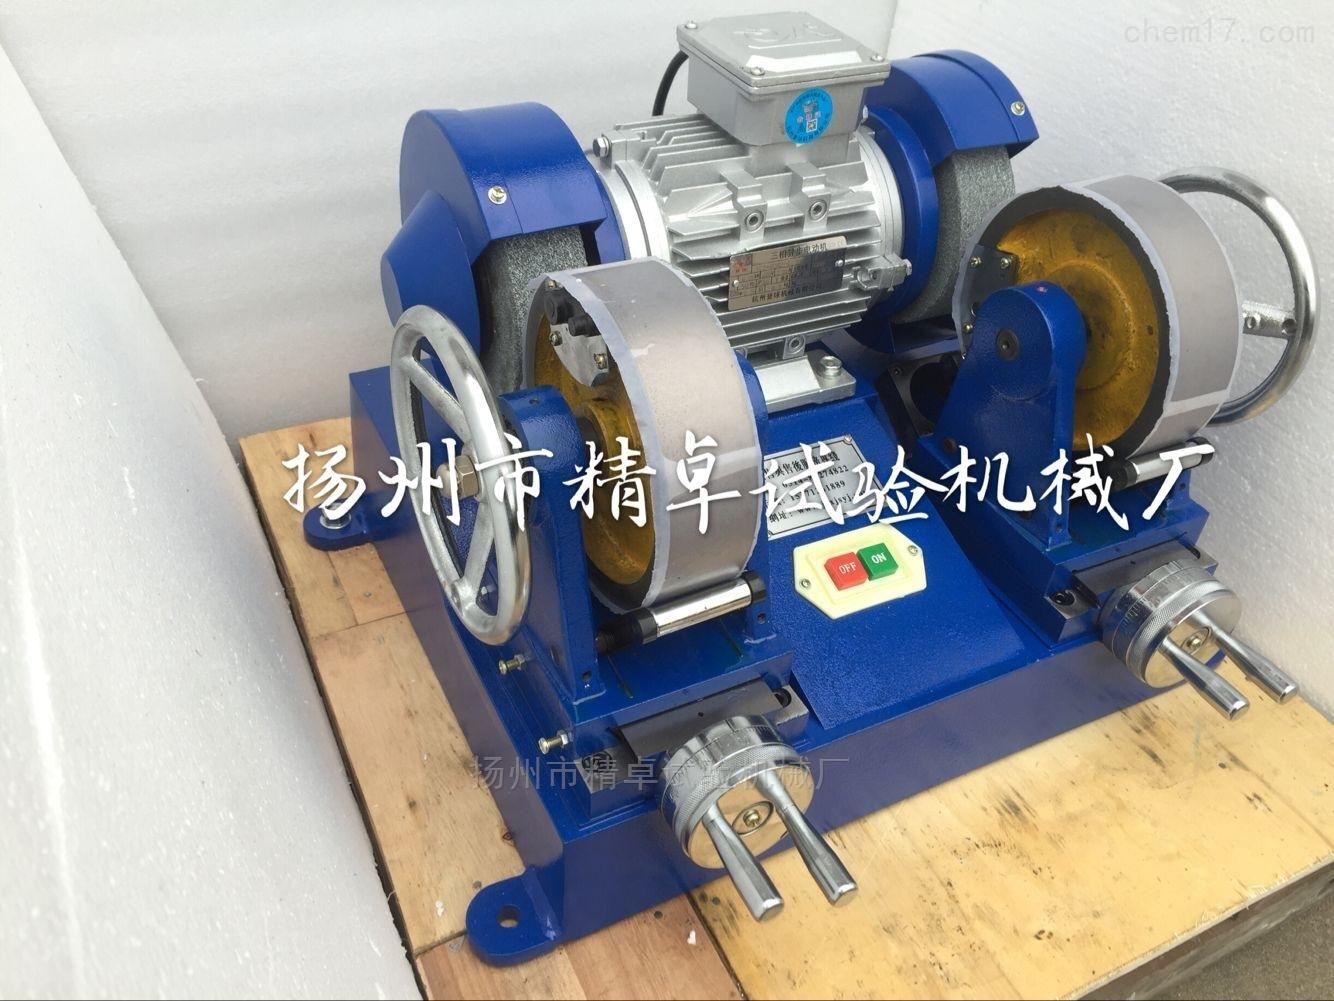 JZ-6031型 双头磨片机-双头磨片机